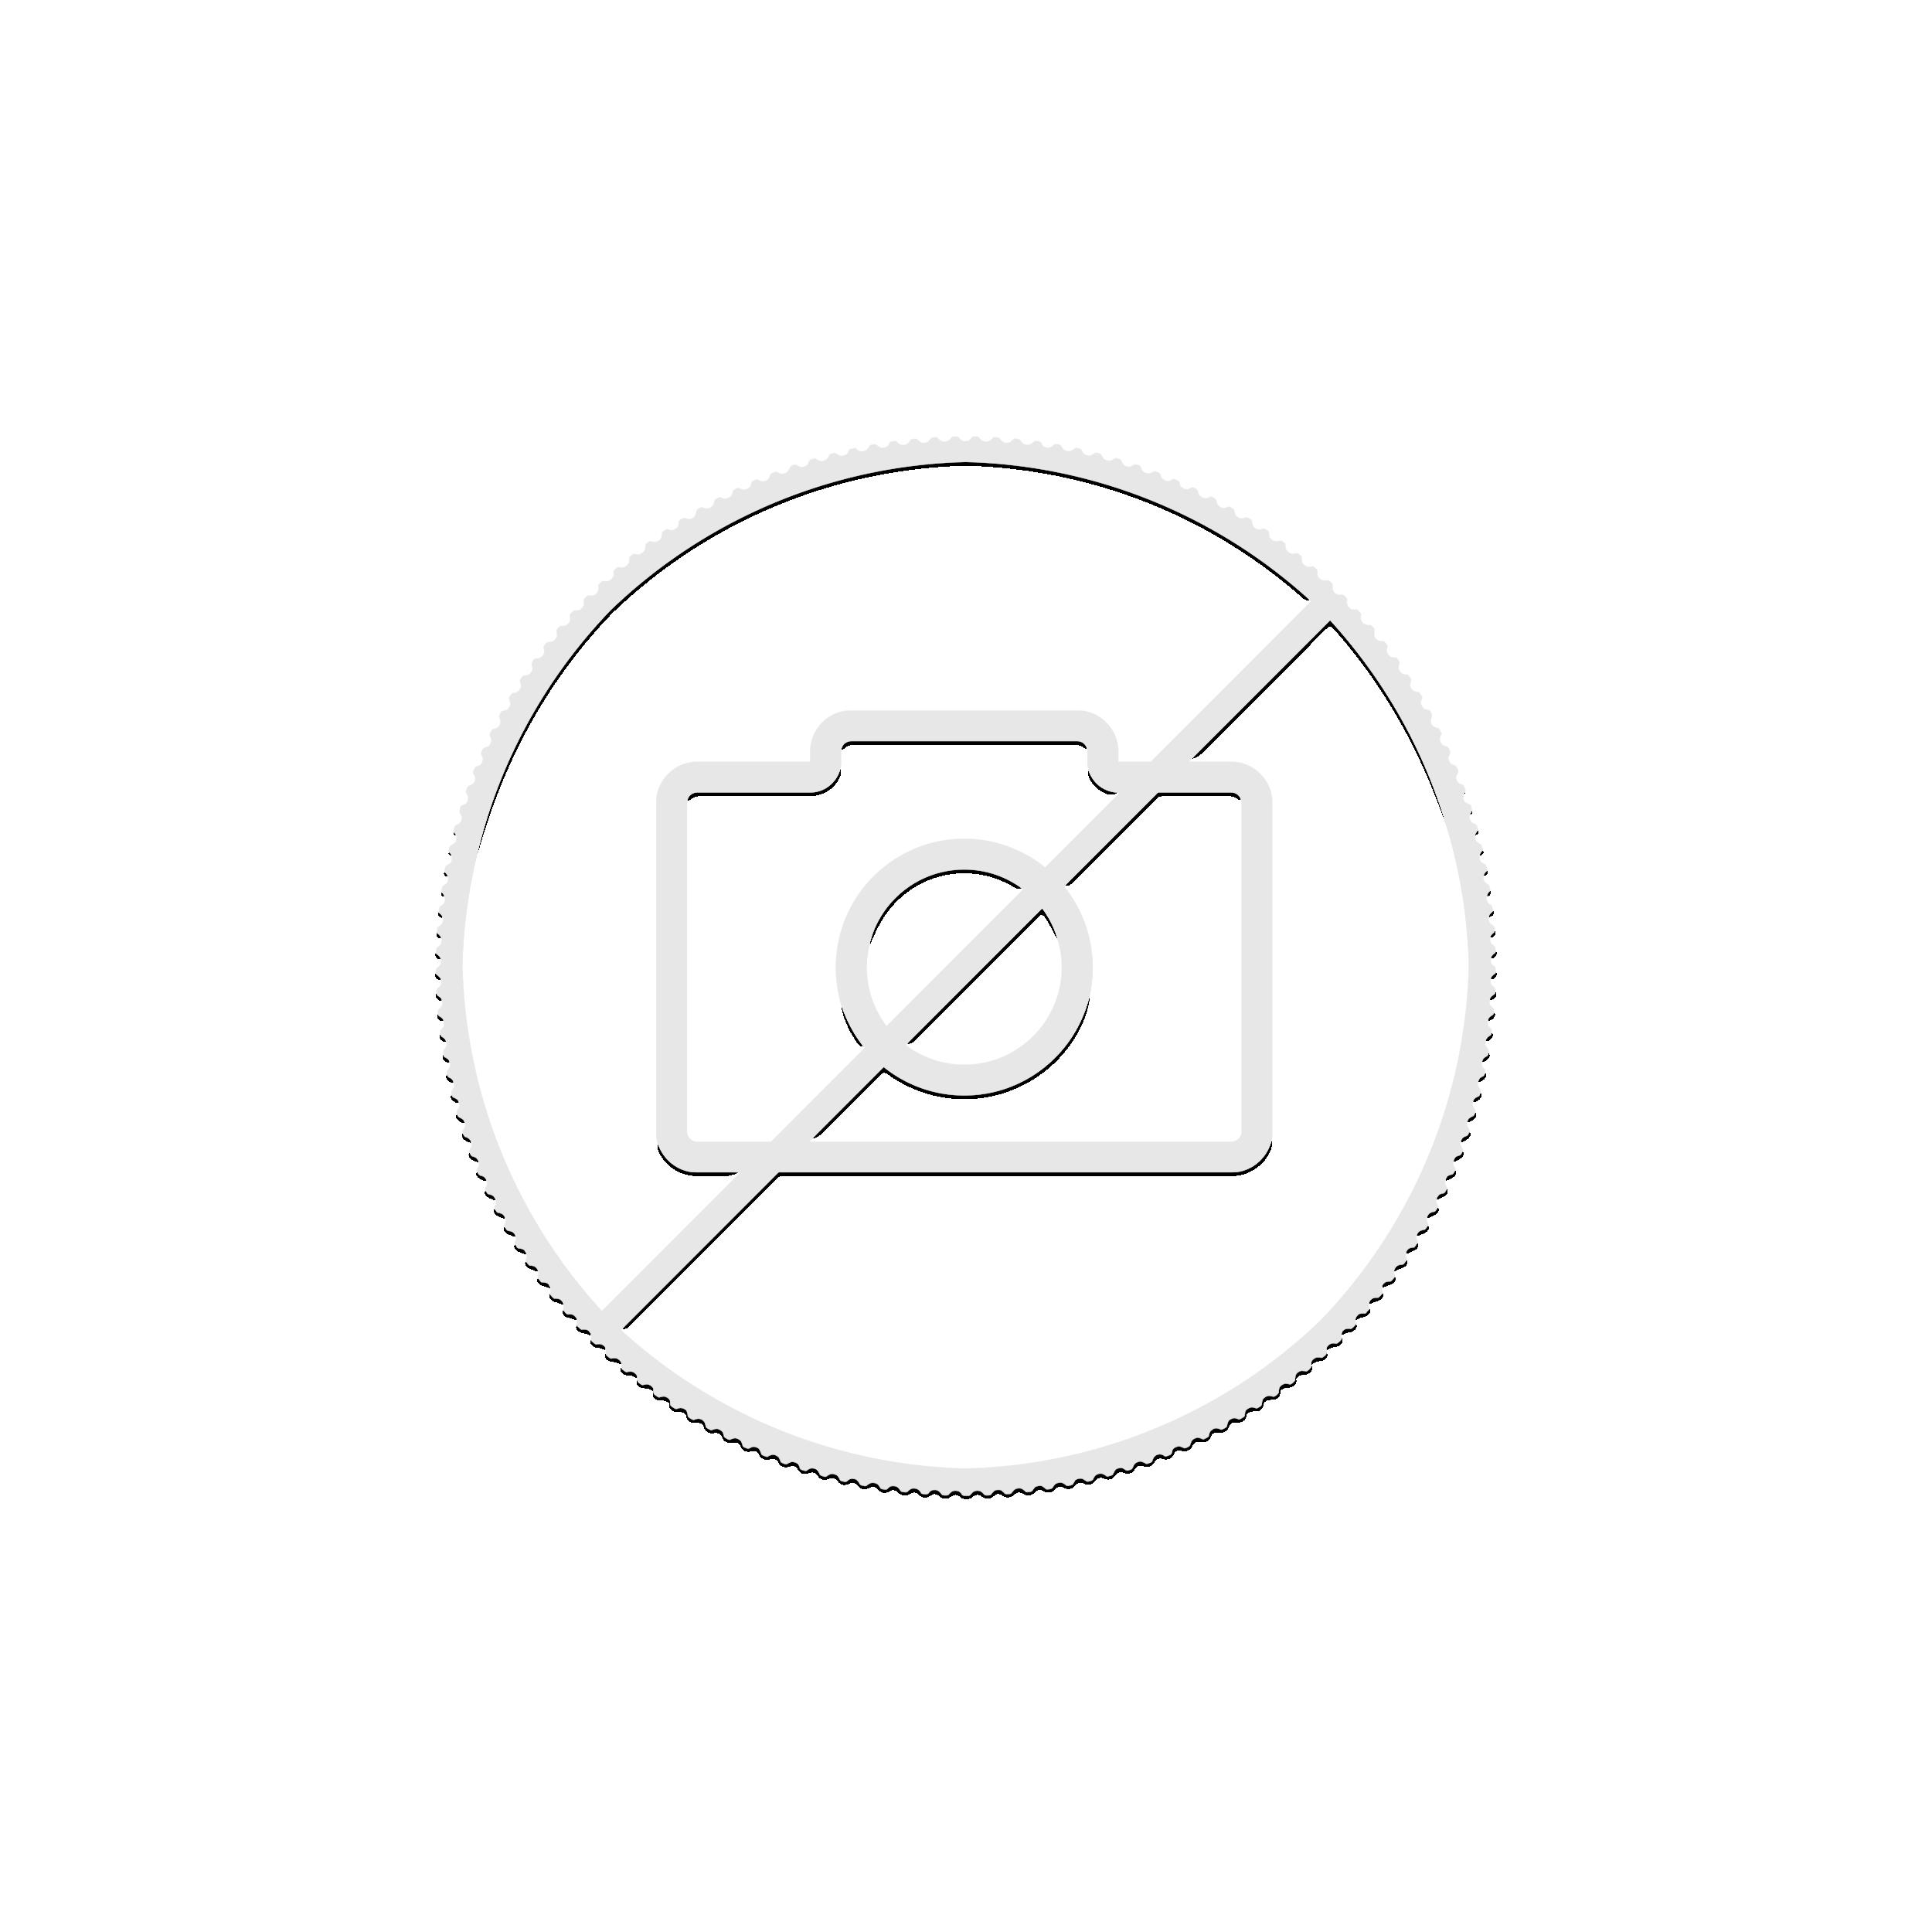 2 Troy ounce zilveren munt Niue Autumn 2017